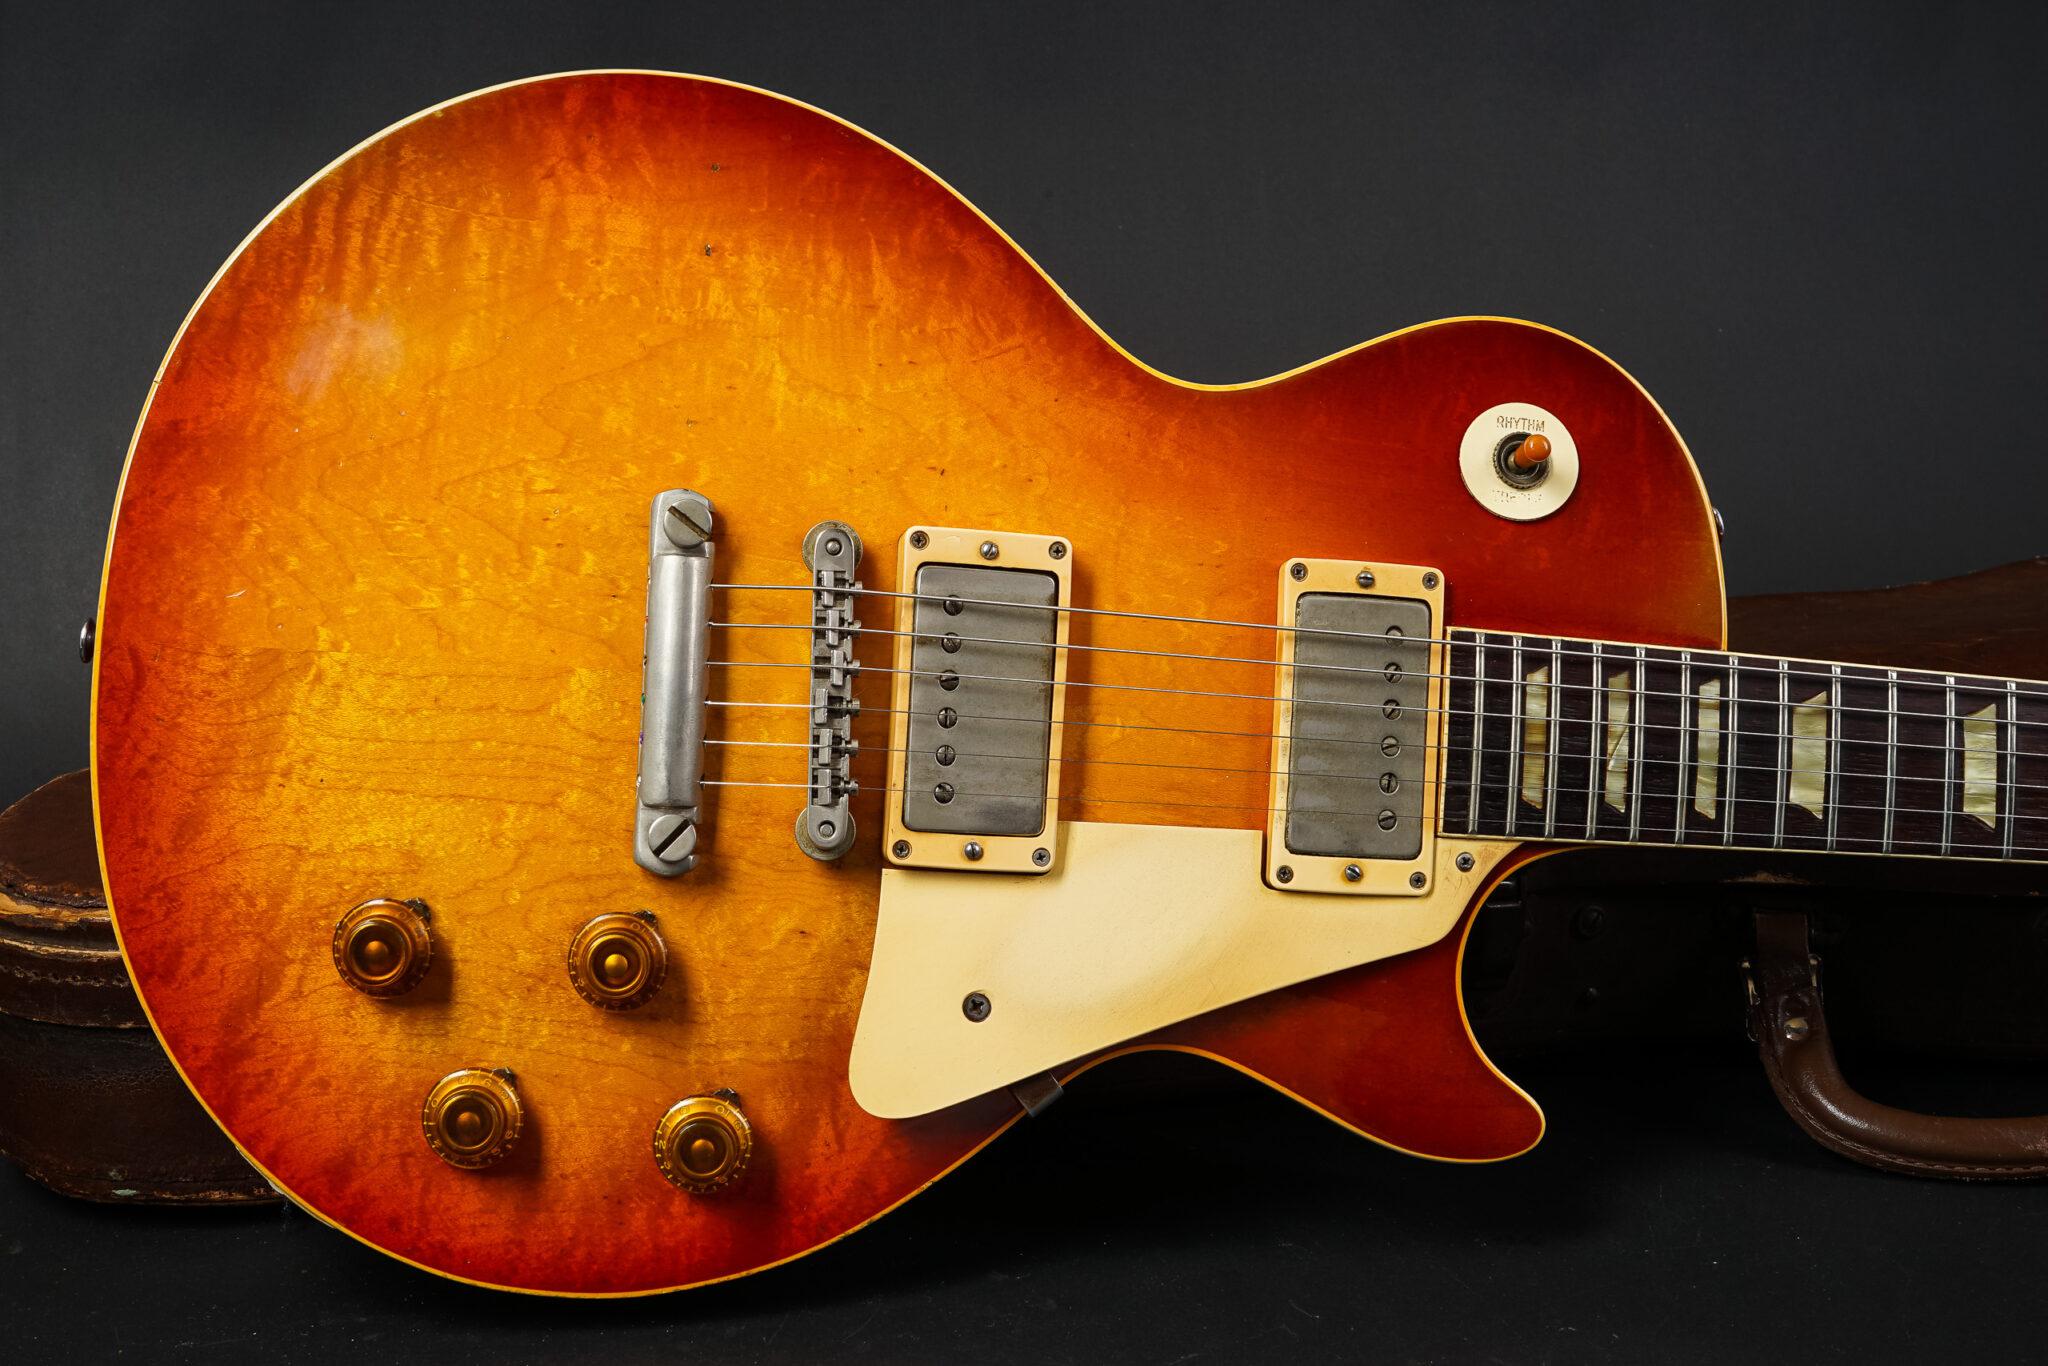 https://guitarpoint.de/app/uploads/products/1959-gibson-les-paul-standard-sunburst/1959-Gibson-Les-Paul-Sunburst-90311-28-2048x1366.jpg